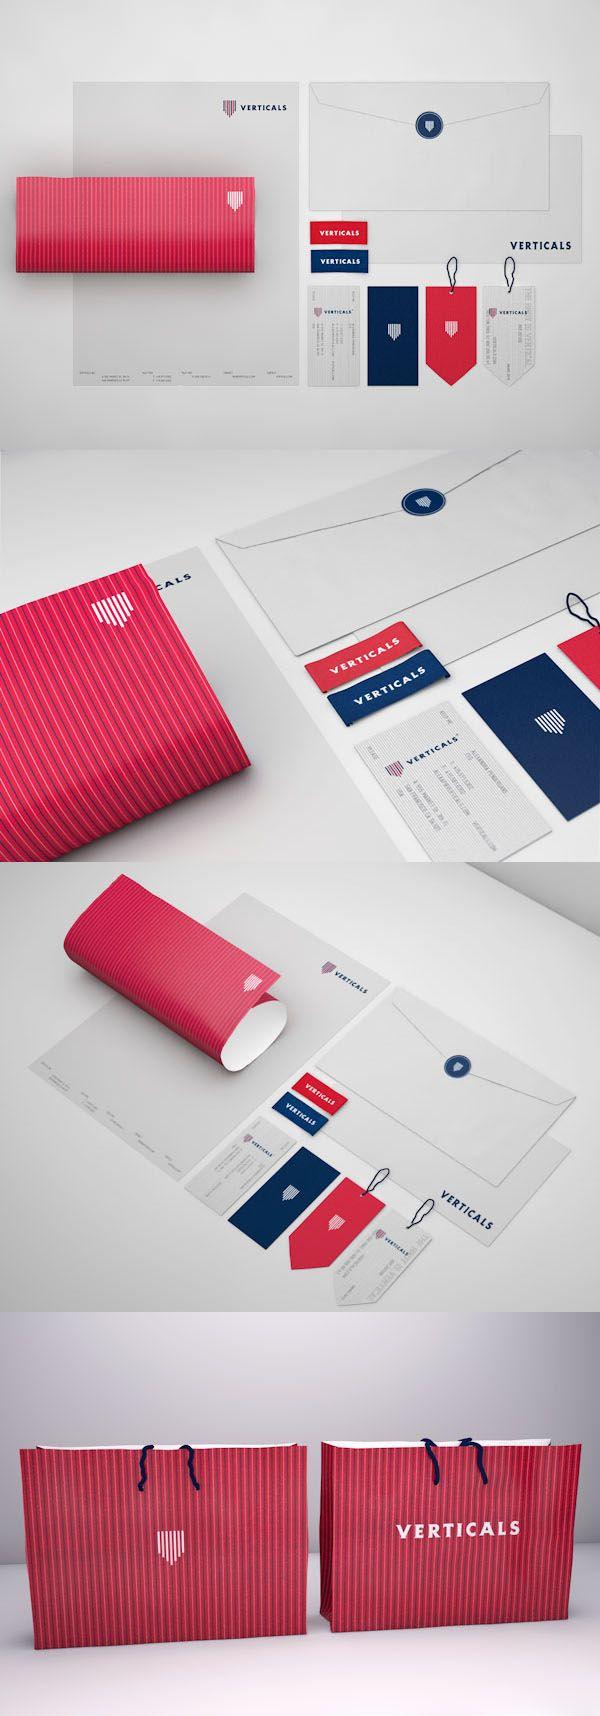 Verticals #identity #packaging #branding #marketing PD